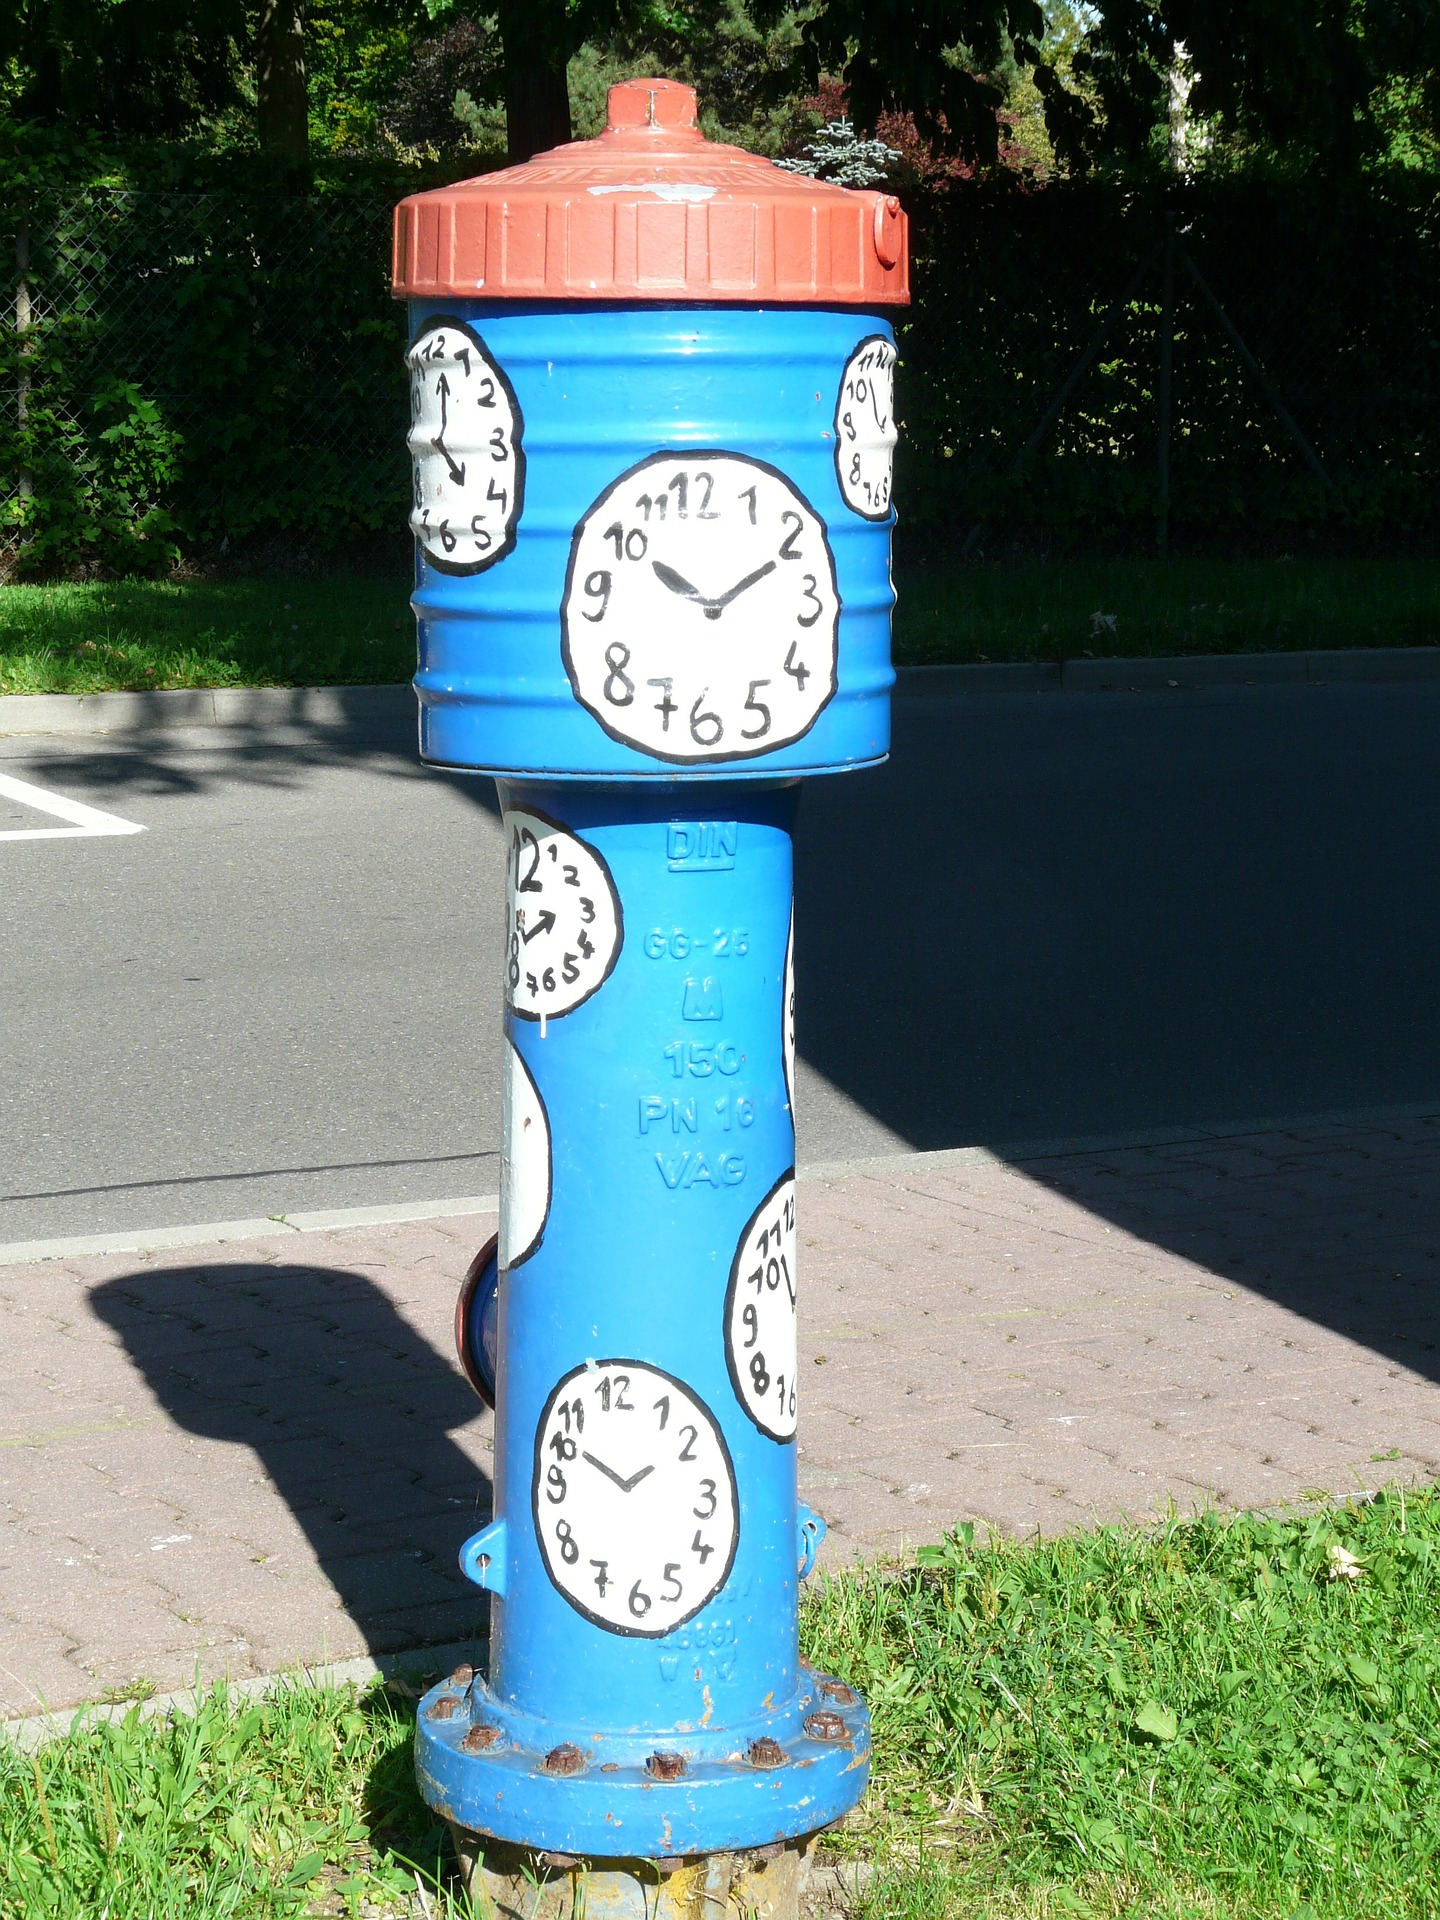 hydrant-58859_1920.jpg